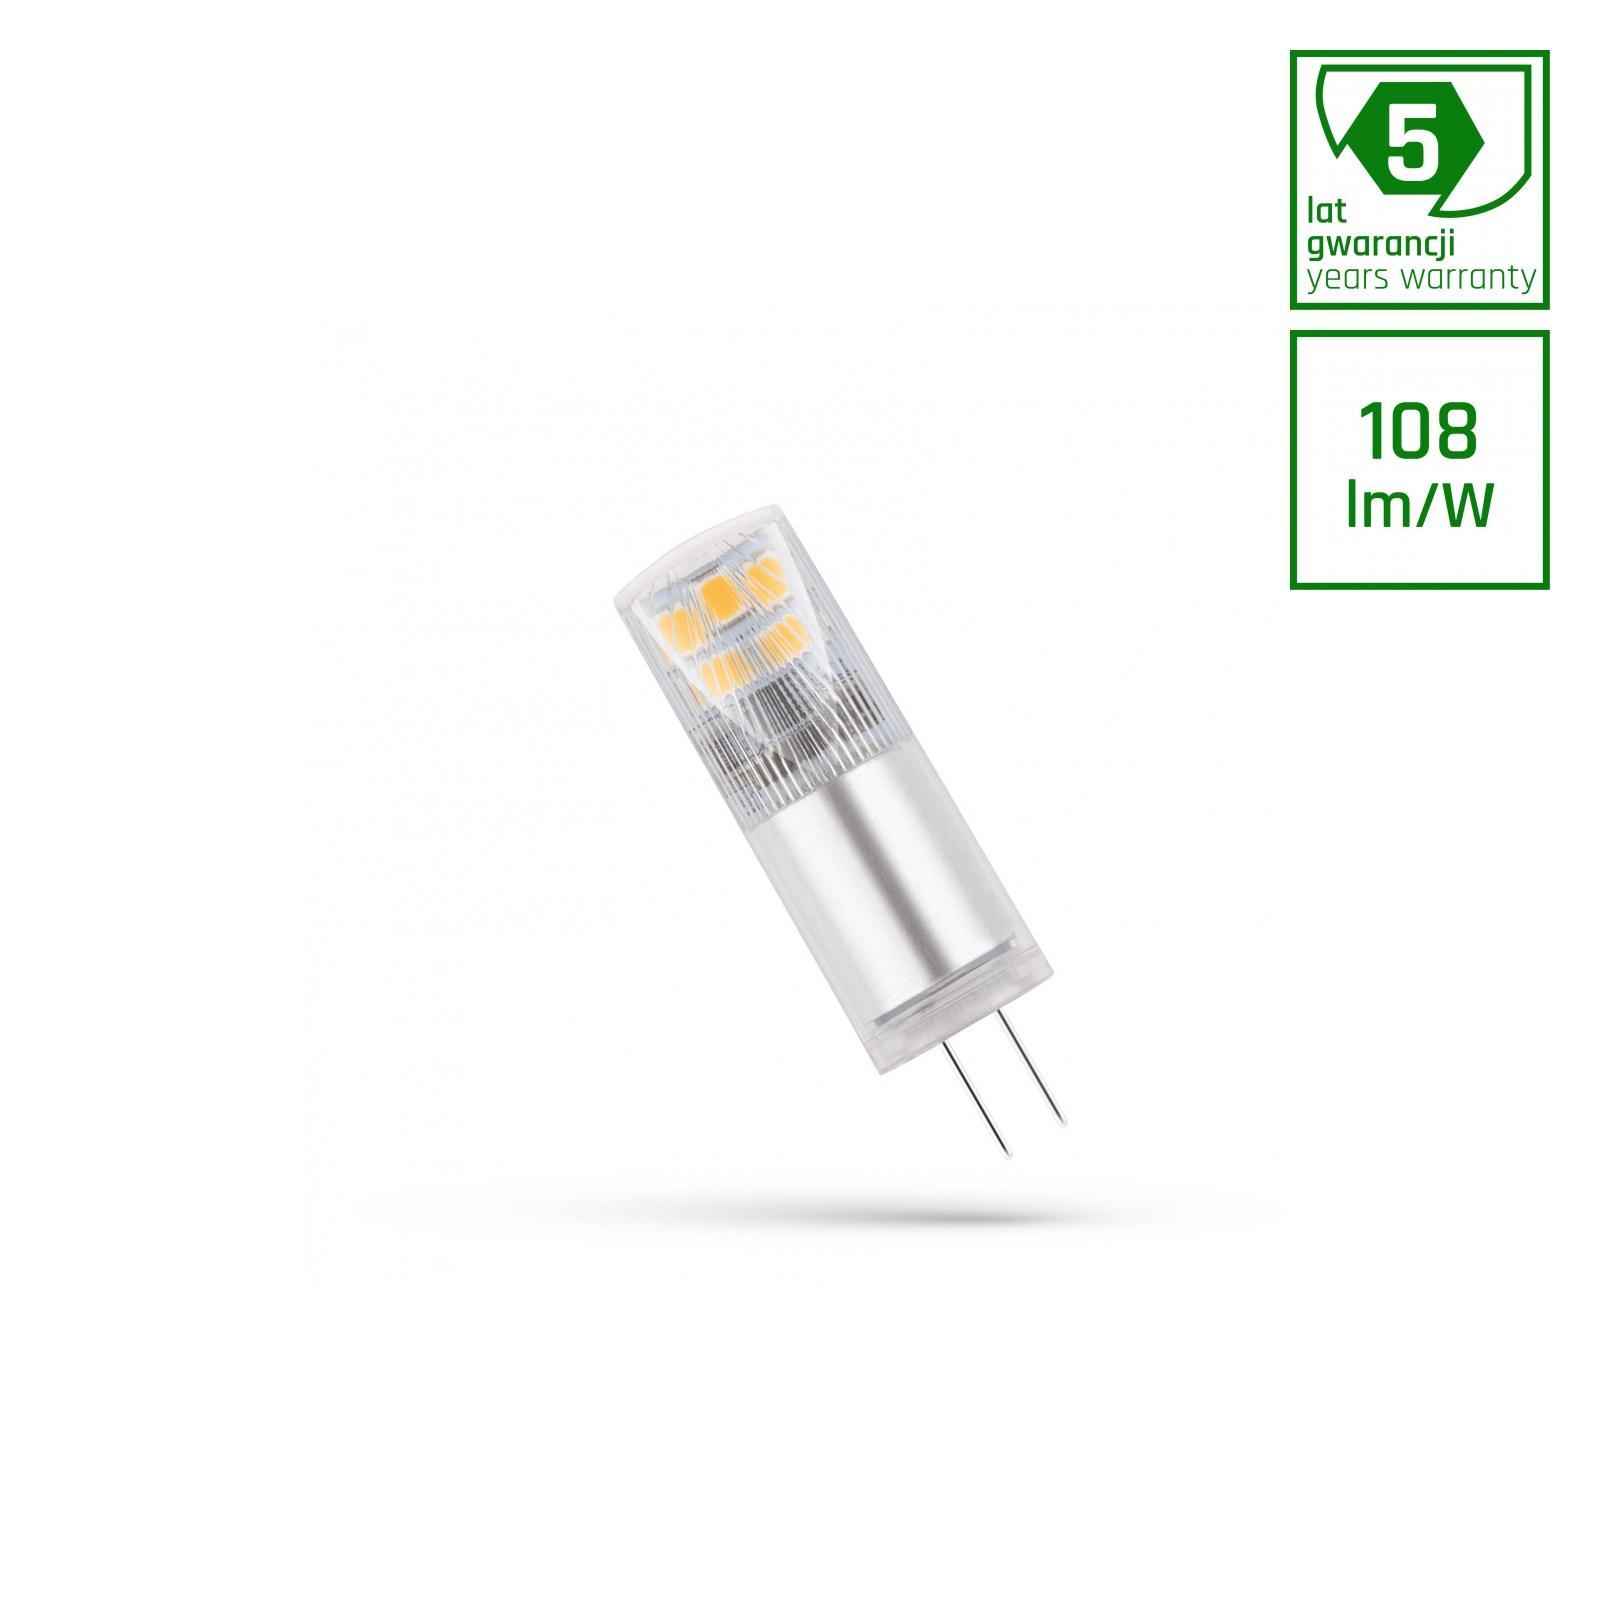 LED G4 12V 2,5W Teplá bílá 5 LAT PREMIUM SPECTRUM